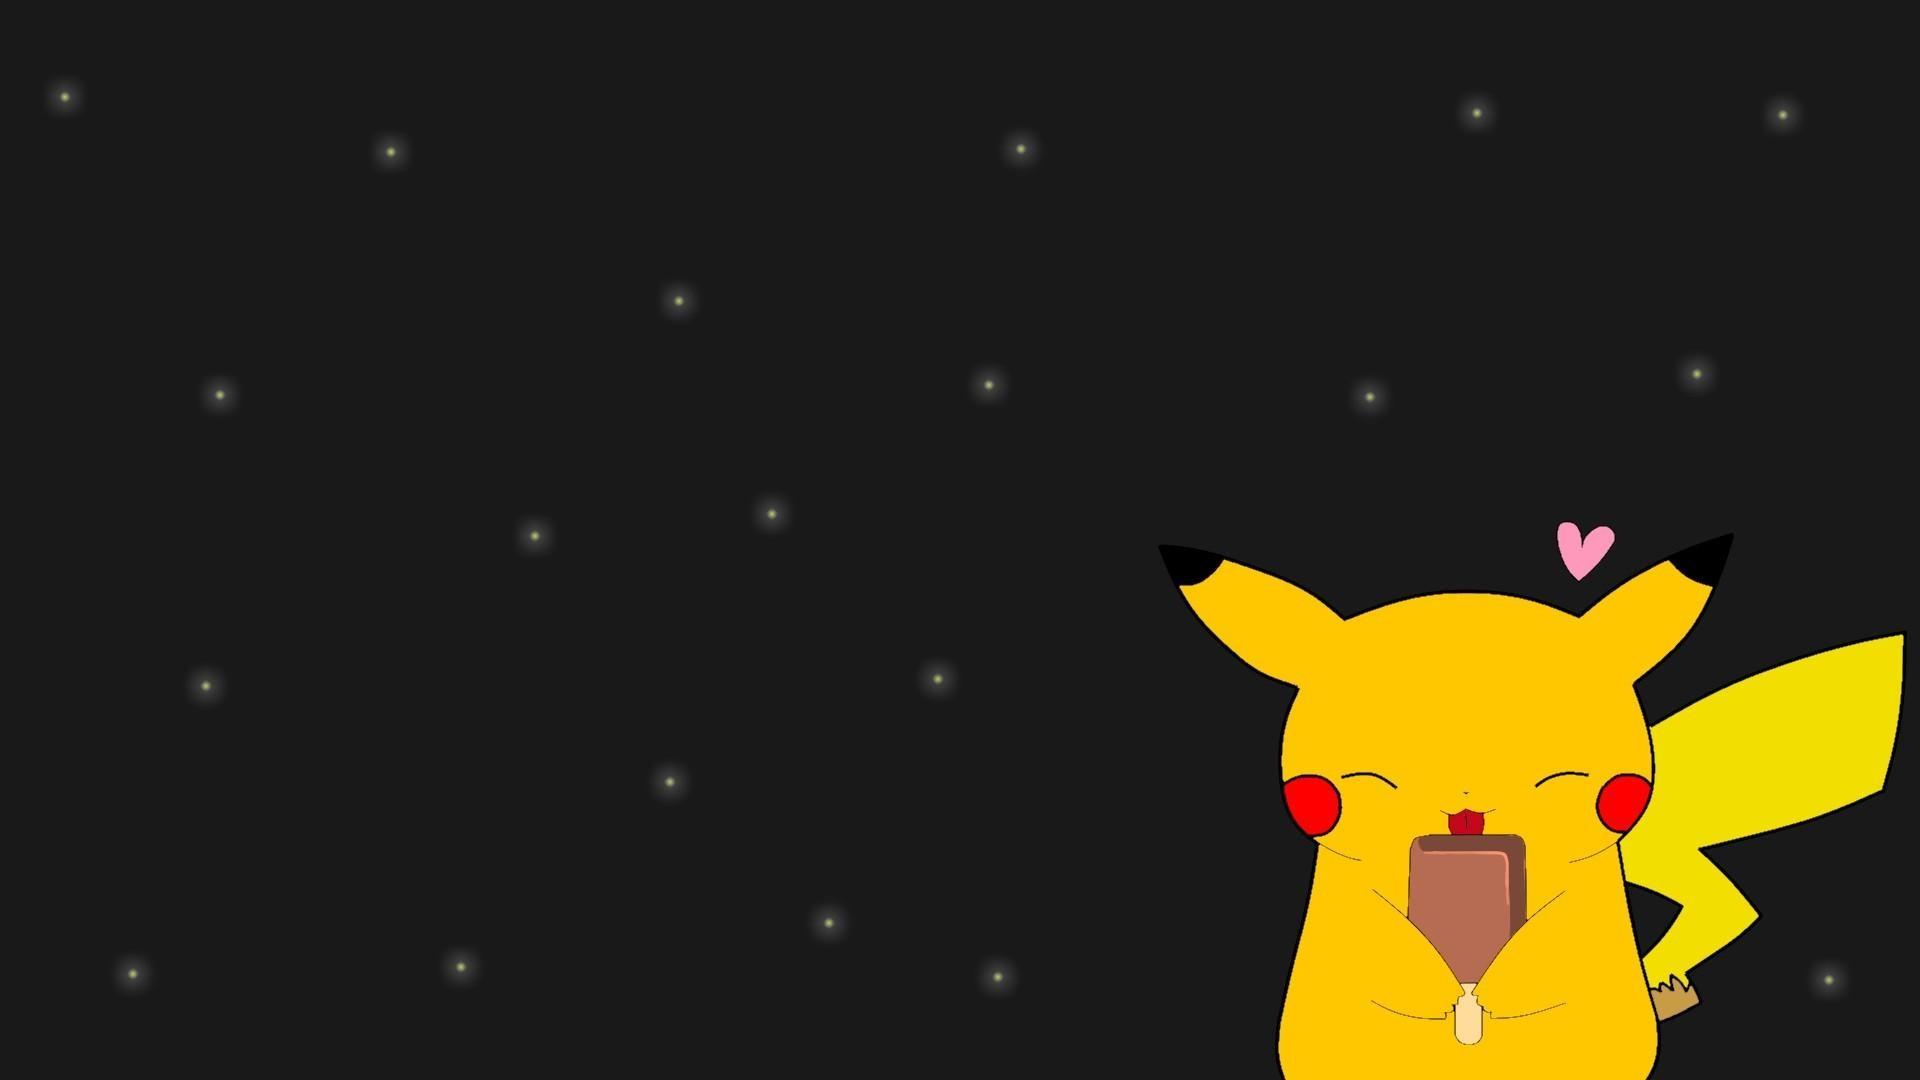 Hình nền Pikachu cầm kem